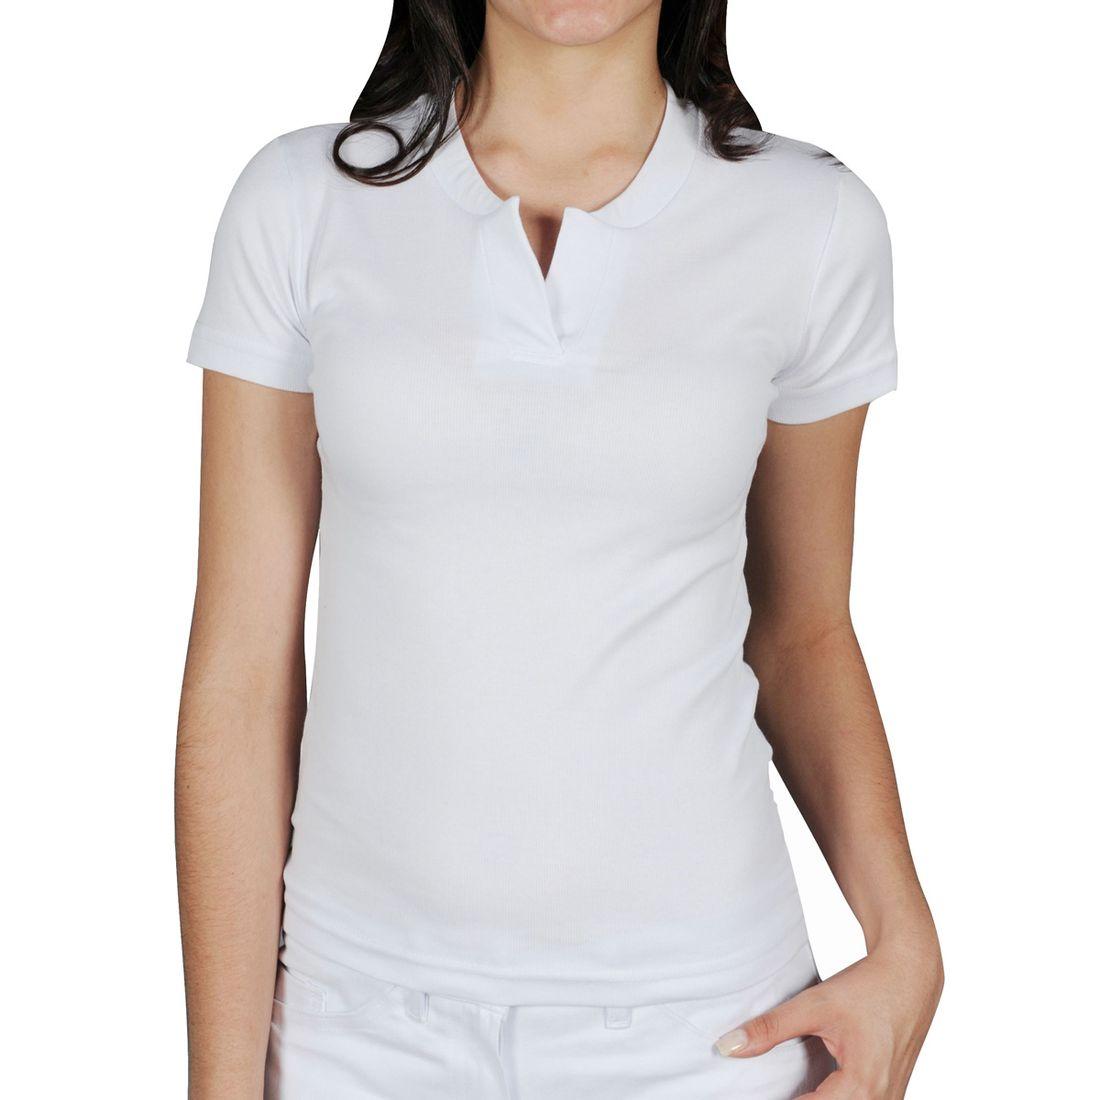 be2582939a Camiseta Canelada Manga Curta Feminina Gola Padre Branca ...